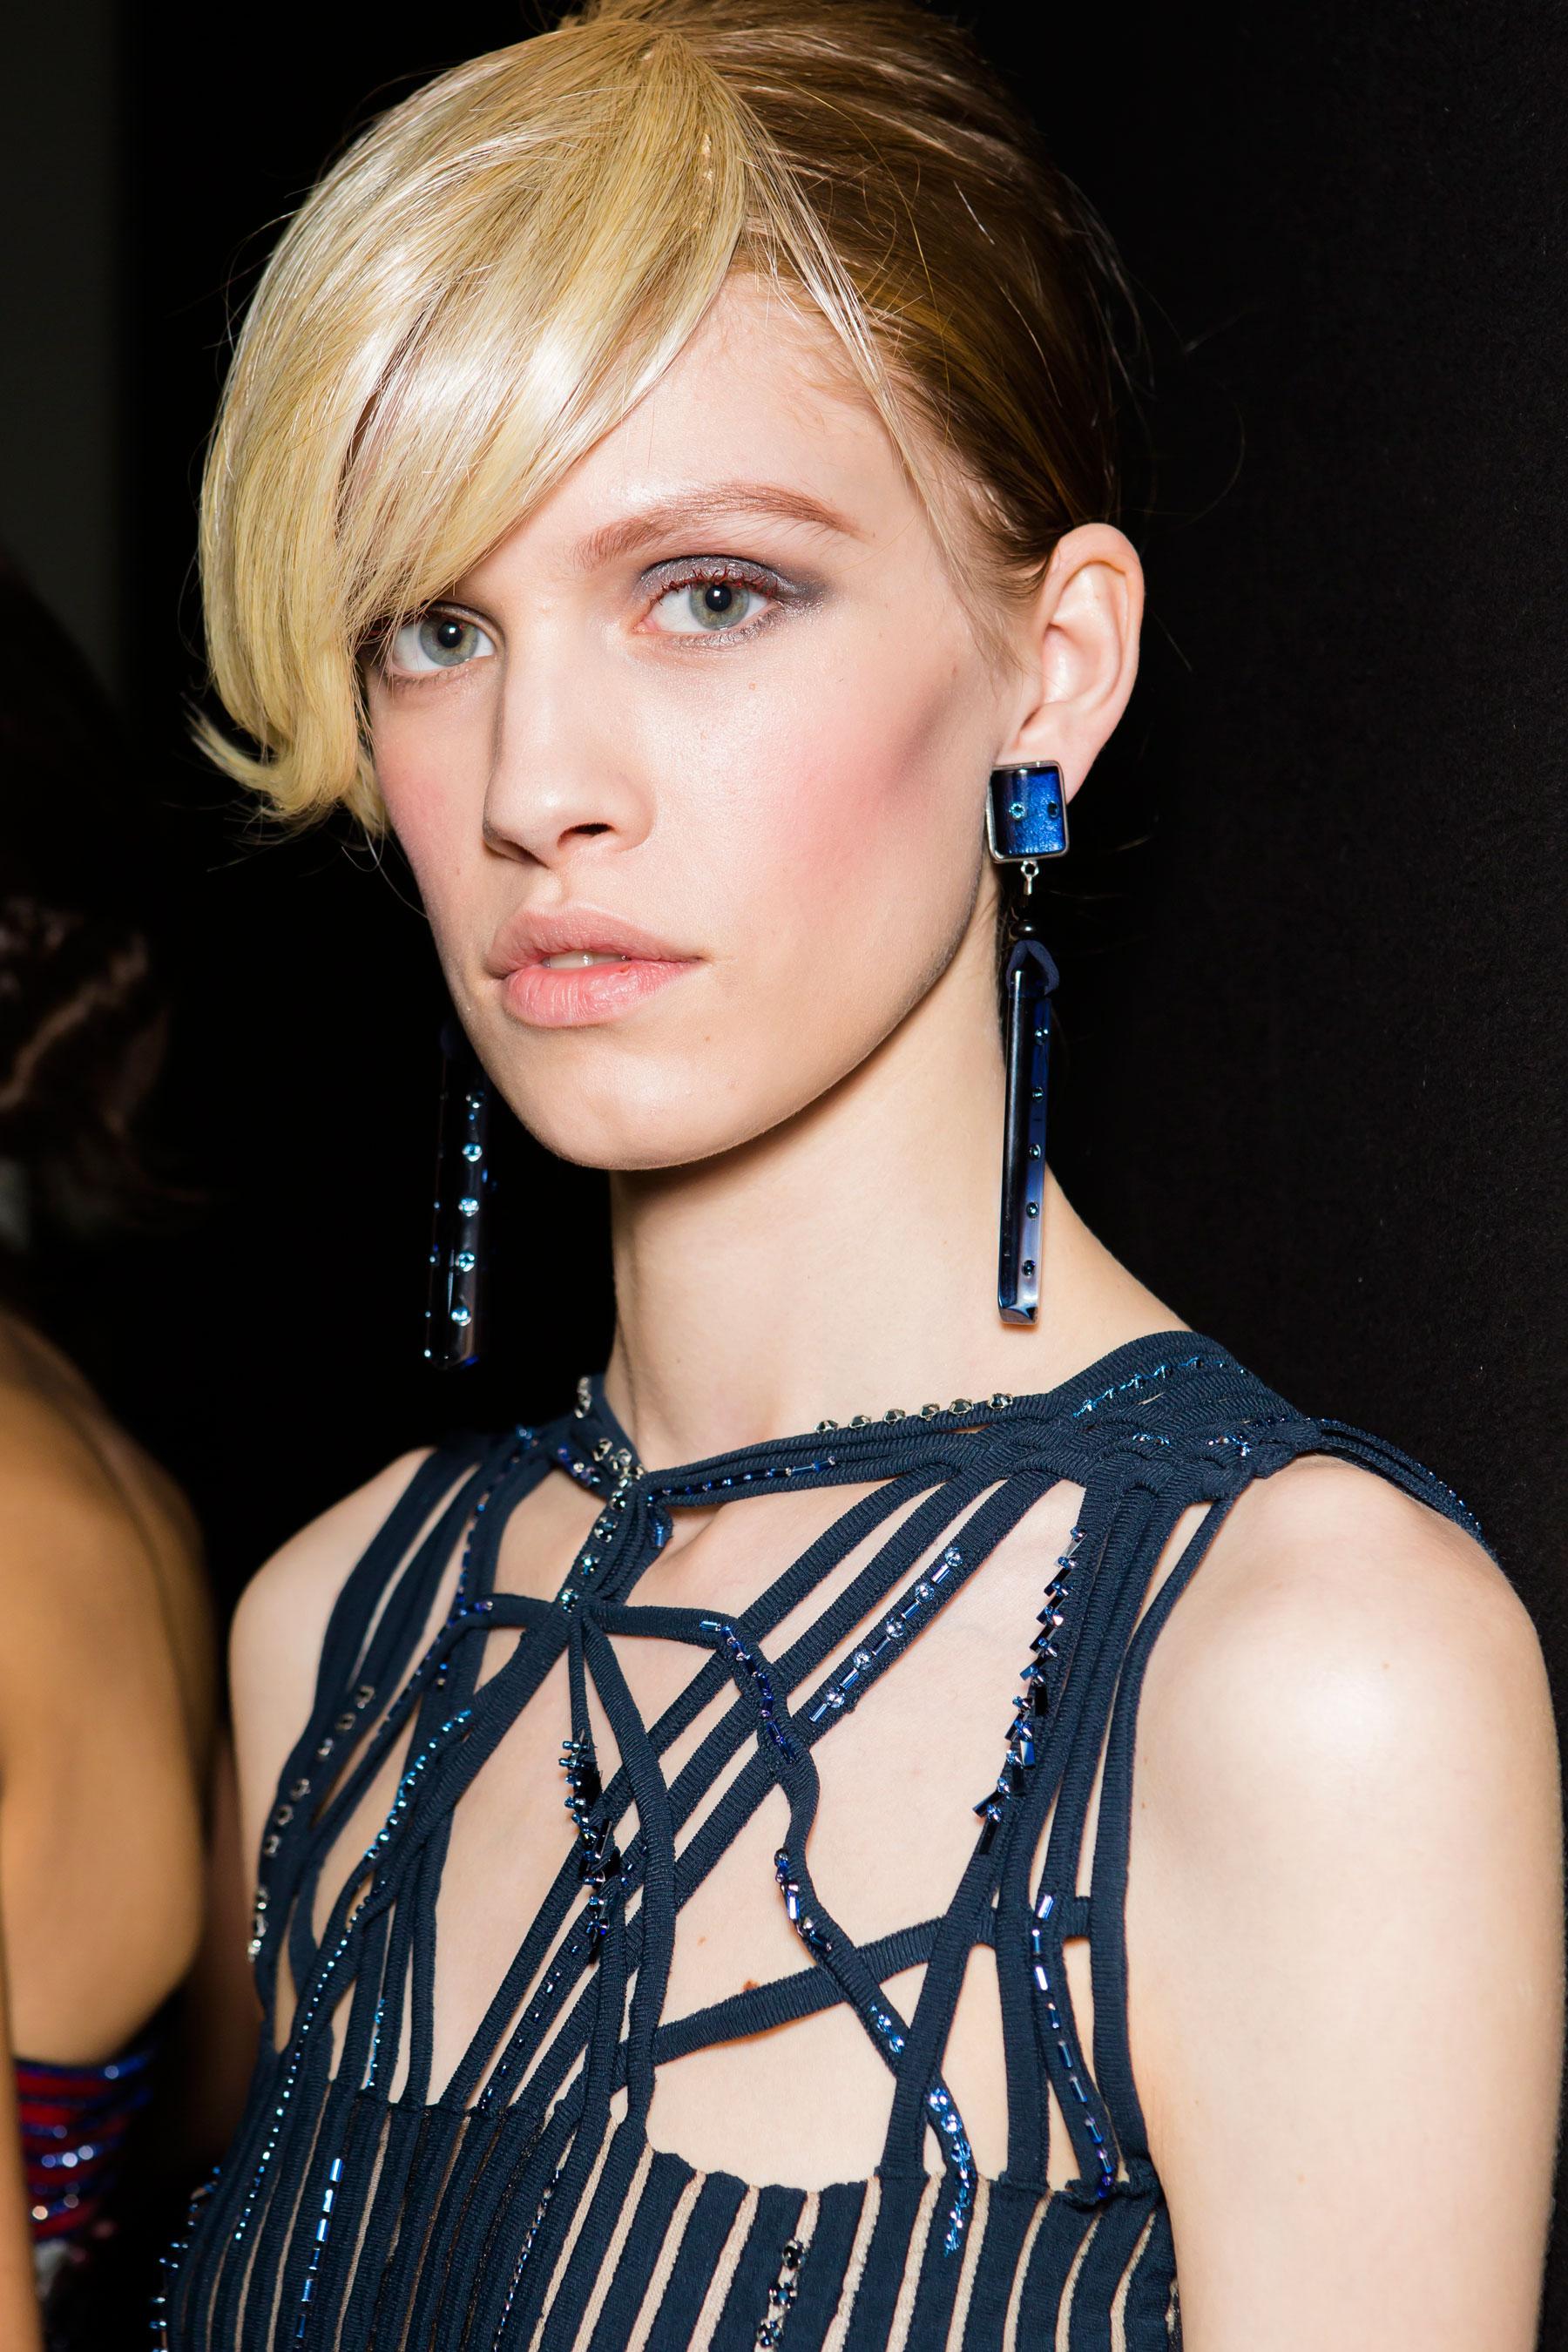 giorgio-armani-spring-2016-beauty-fashion-show-the-impression-15